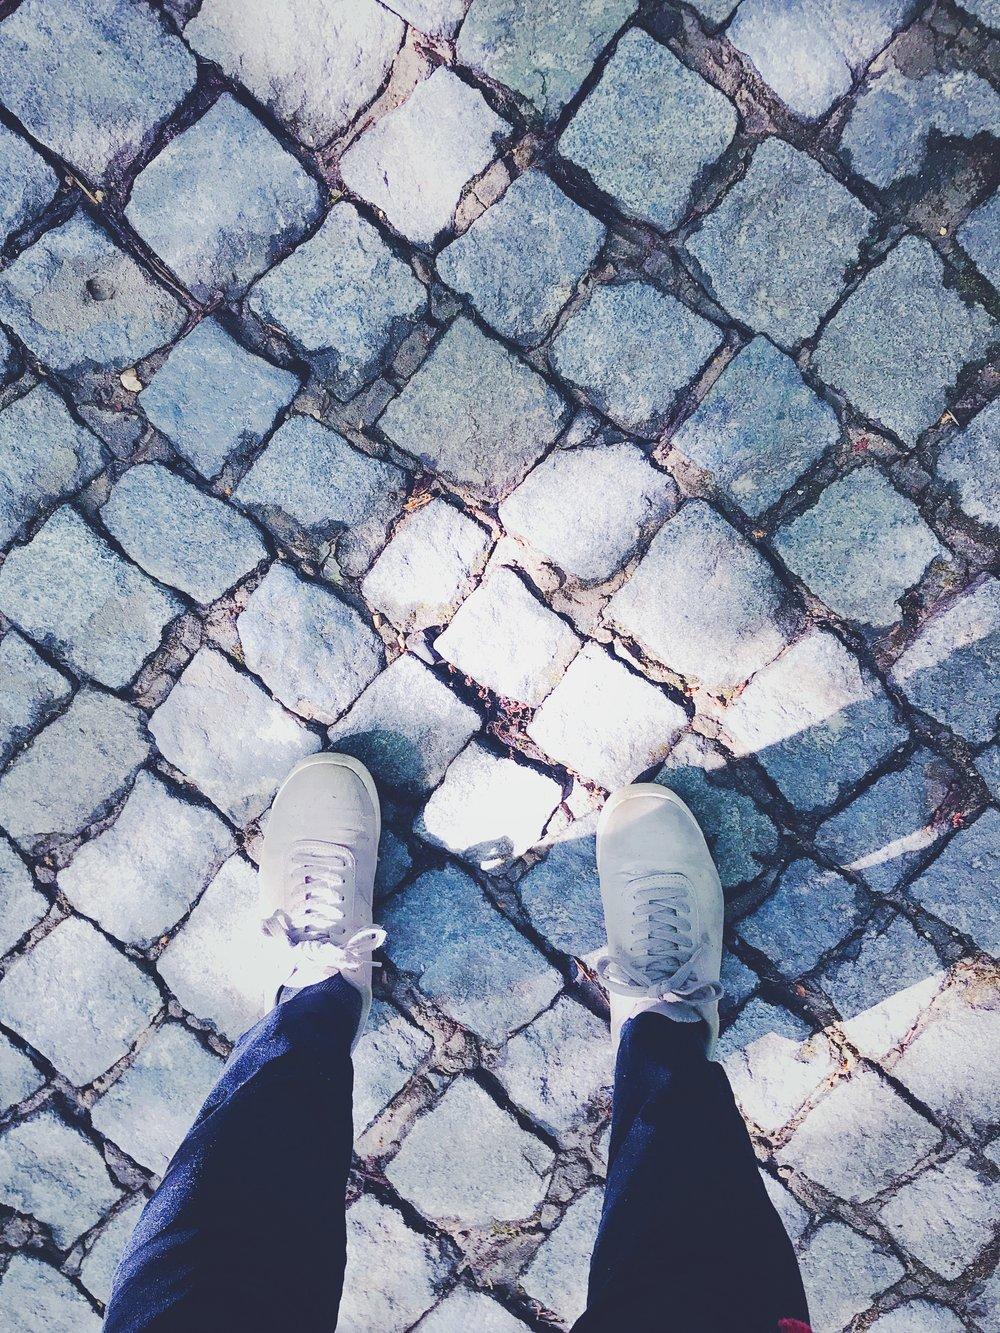 Lisboa sidewalks